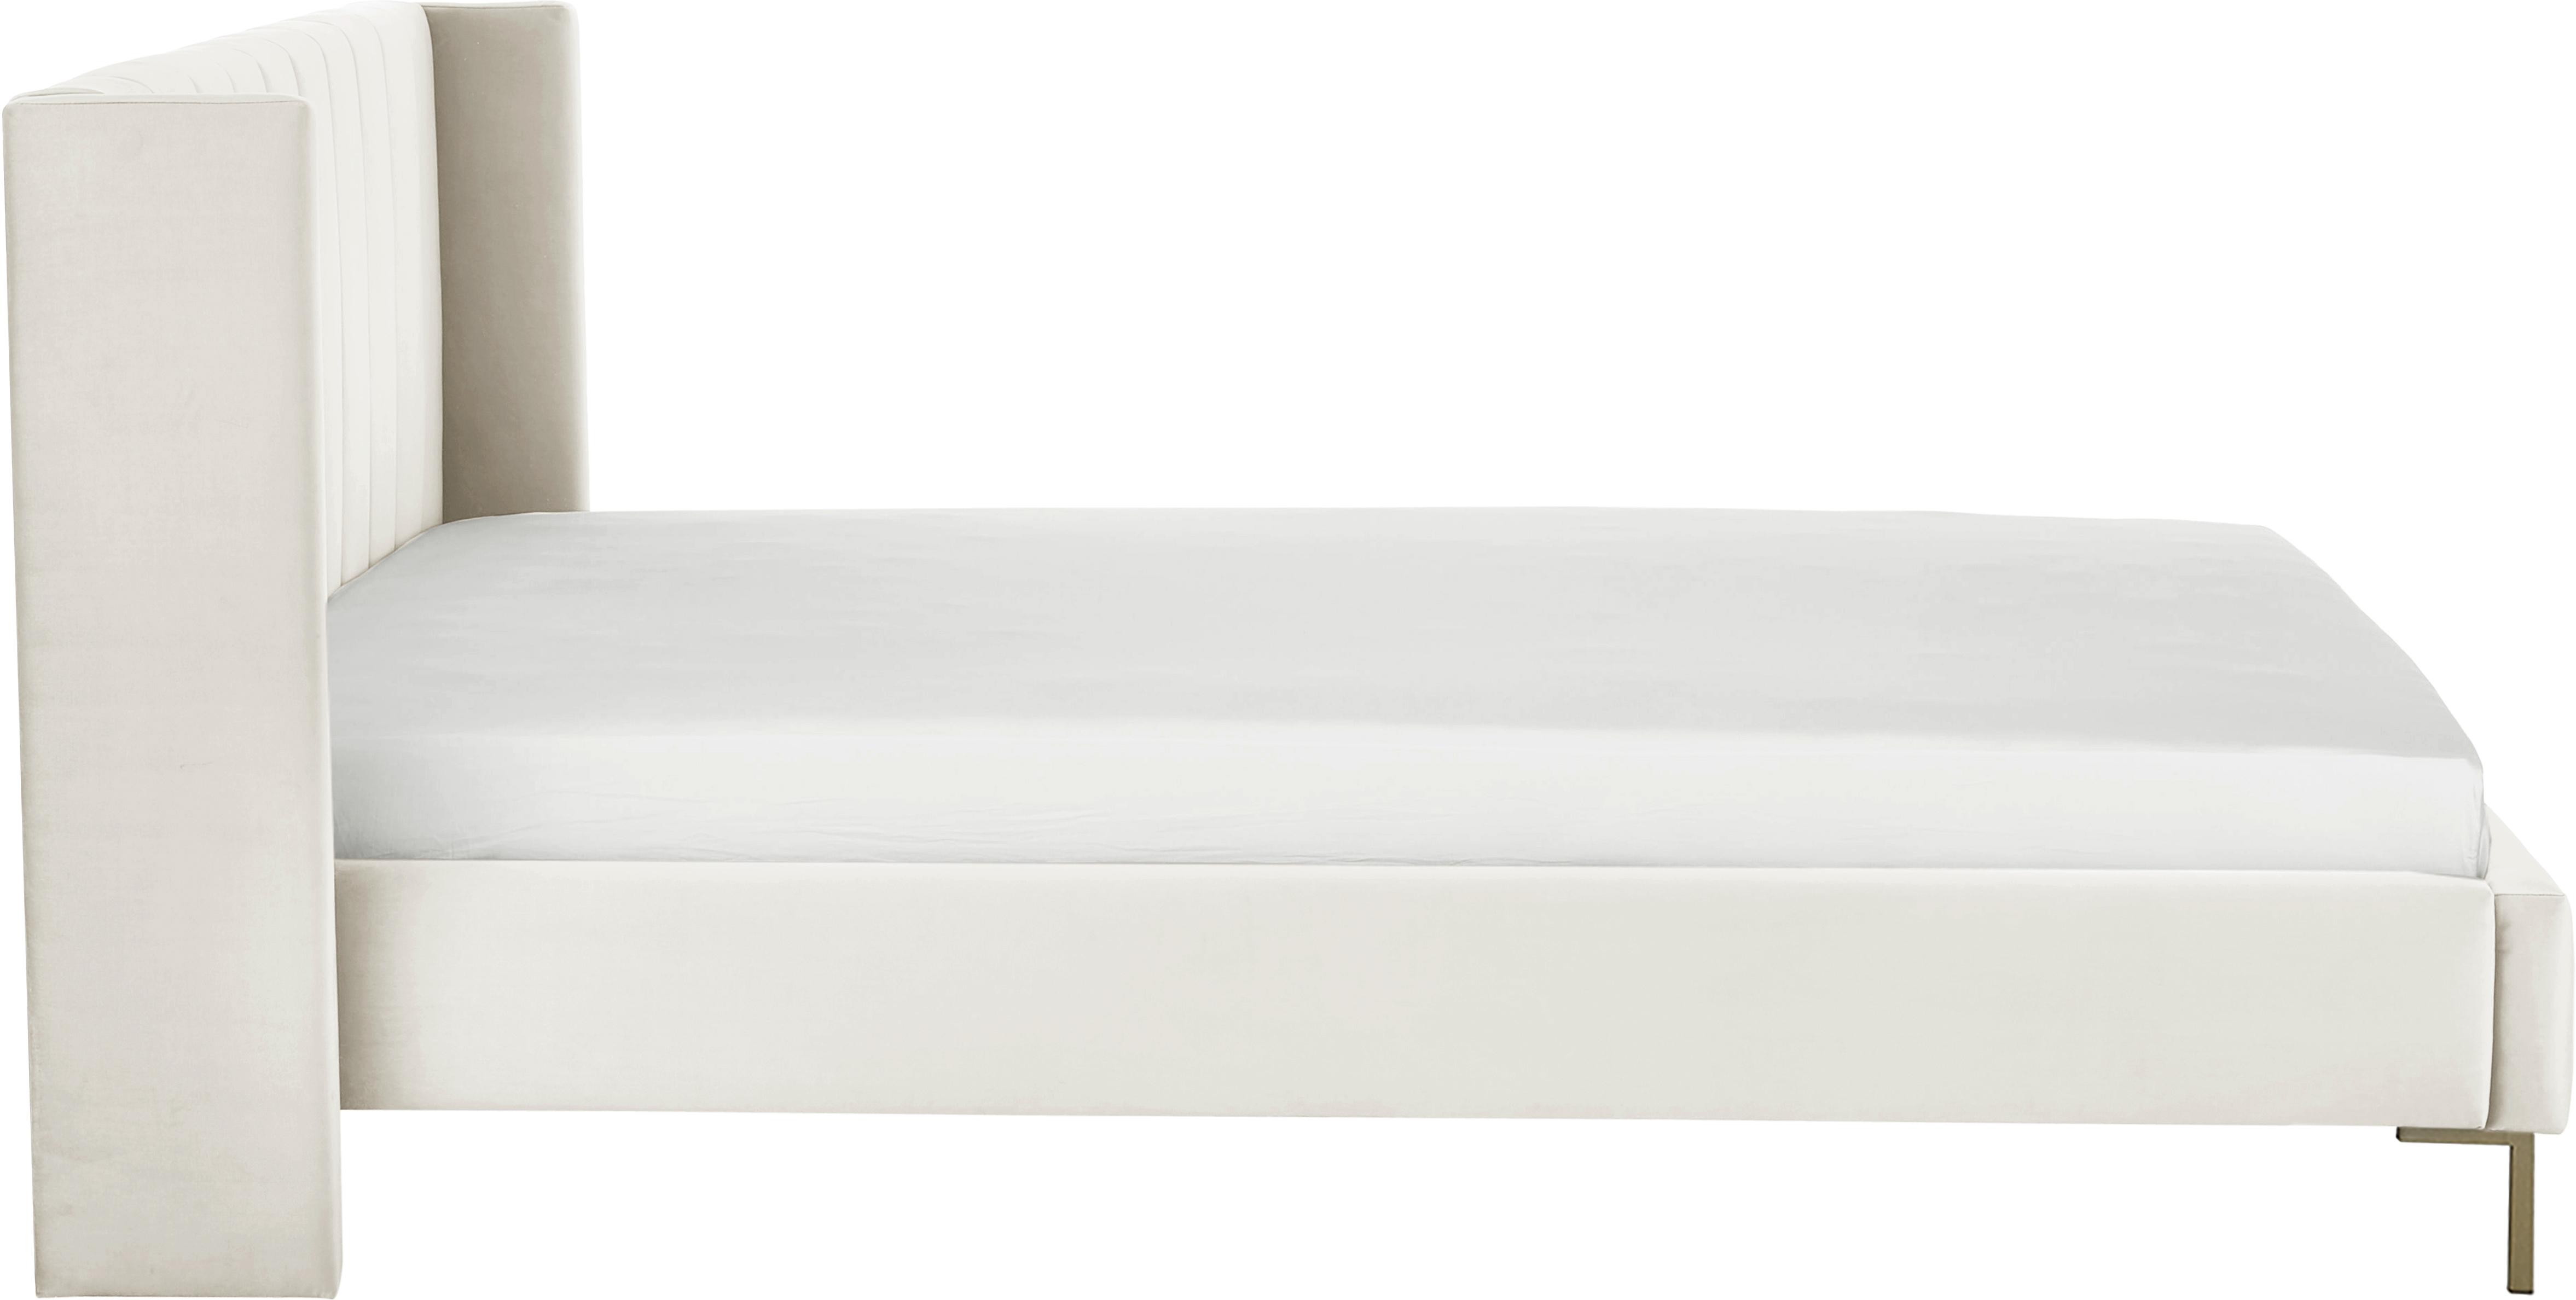 Samt-Polsterbett Dusk, Korpus: Massives Kiefernholz, Füße: Metall, pulverbeschichtet, Bezug: Polyestersamt 30.000 Sche, Beige, 180 x 200 cm